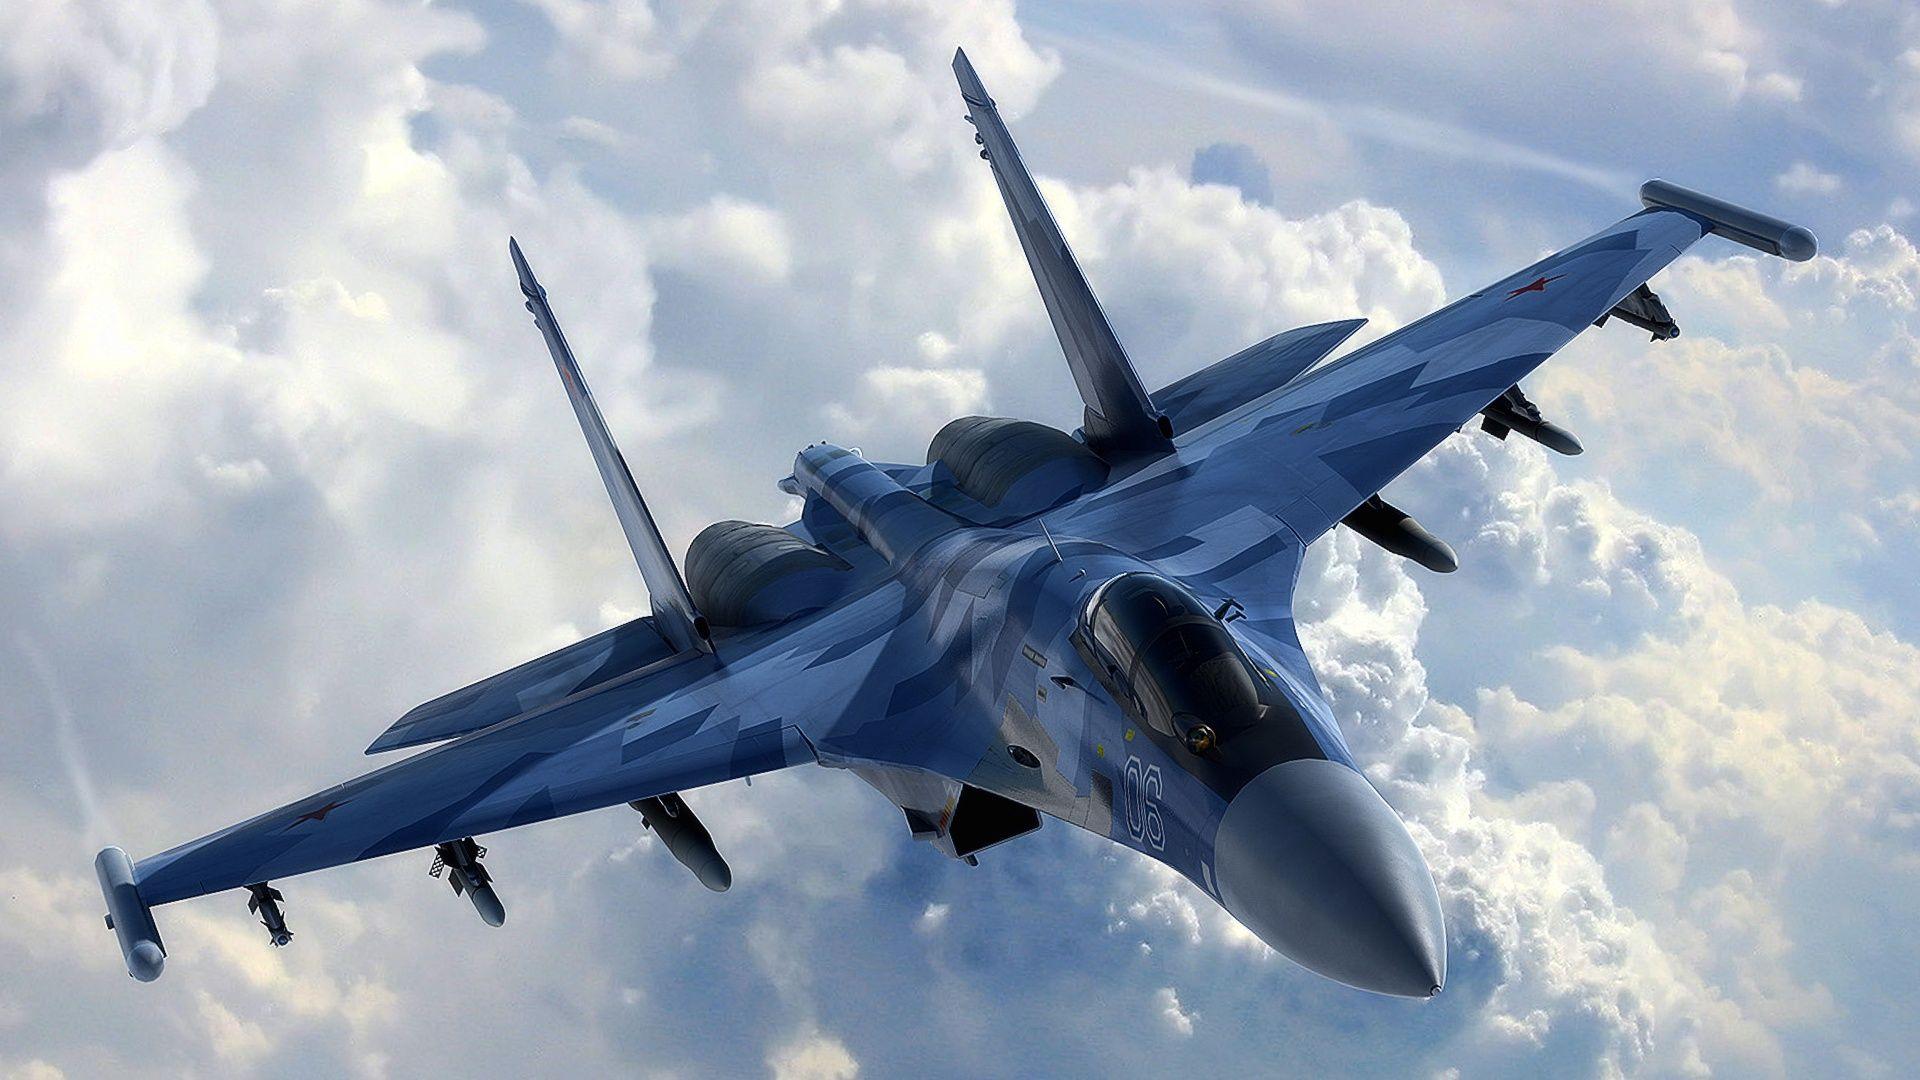 fighter jets jet fighter cool quality hd wallpaper jet fighter